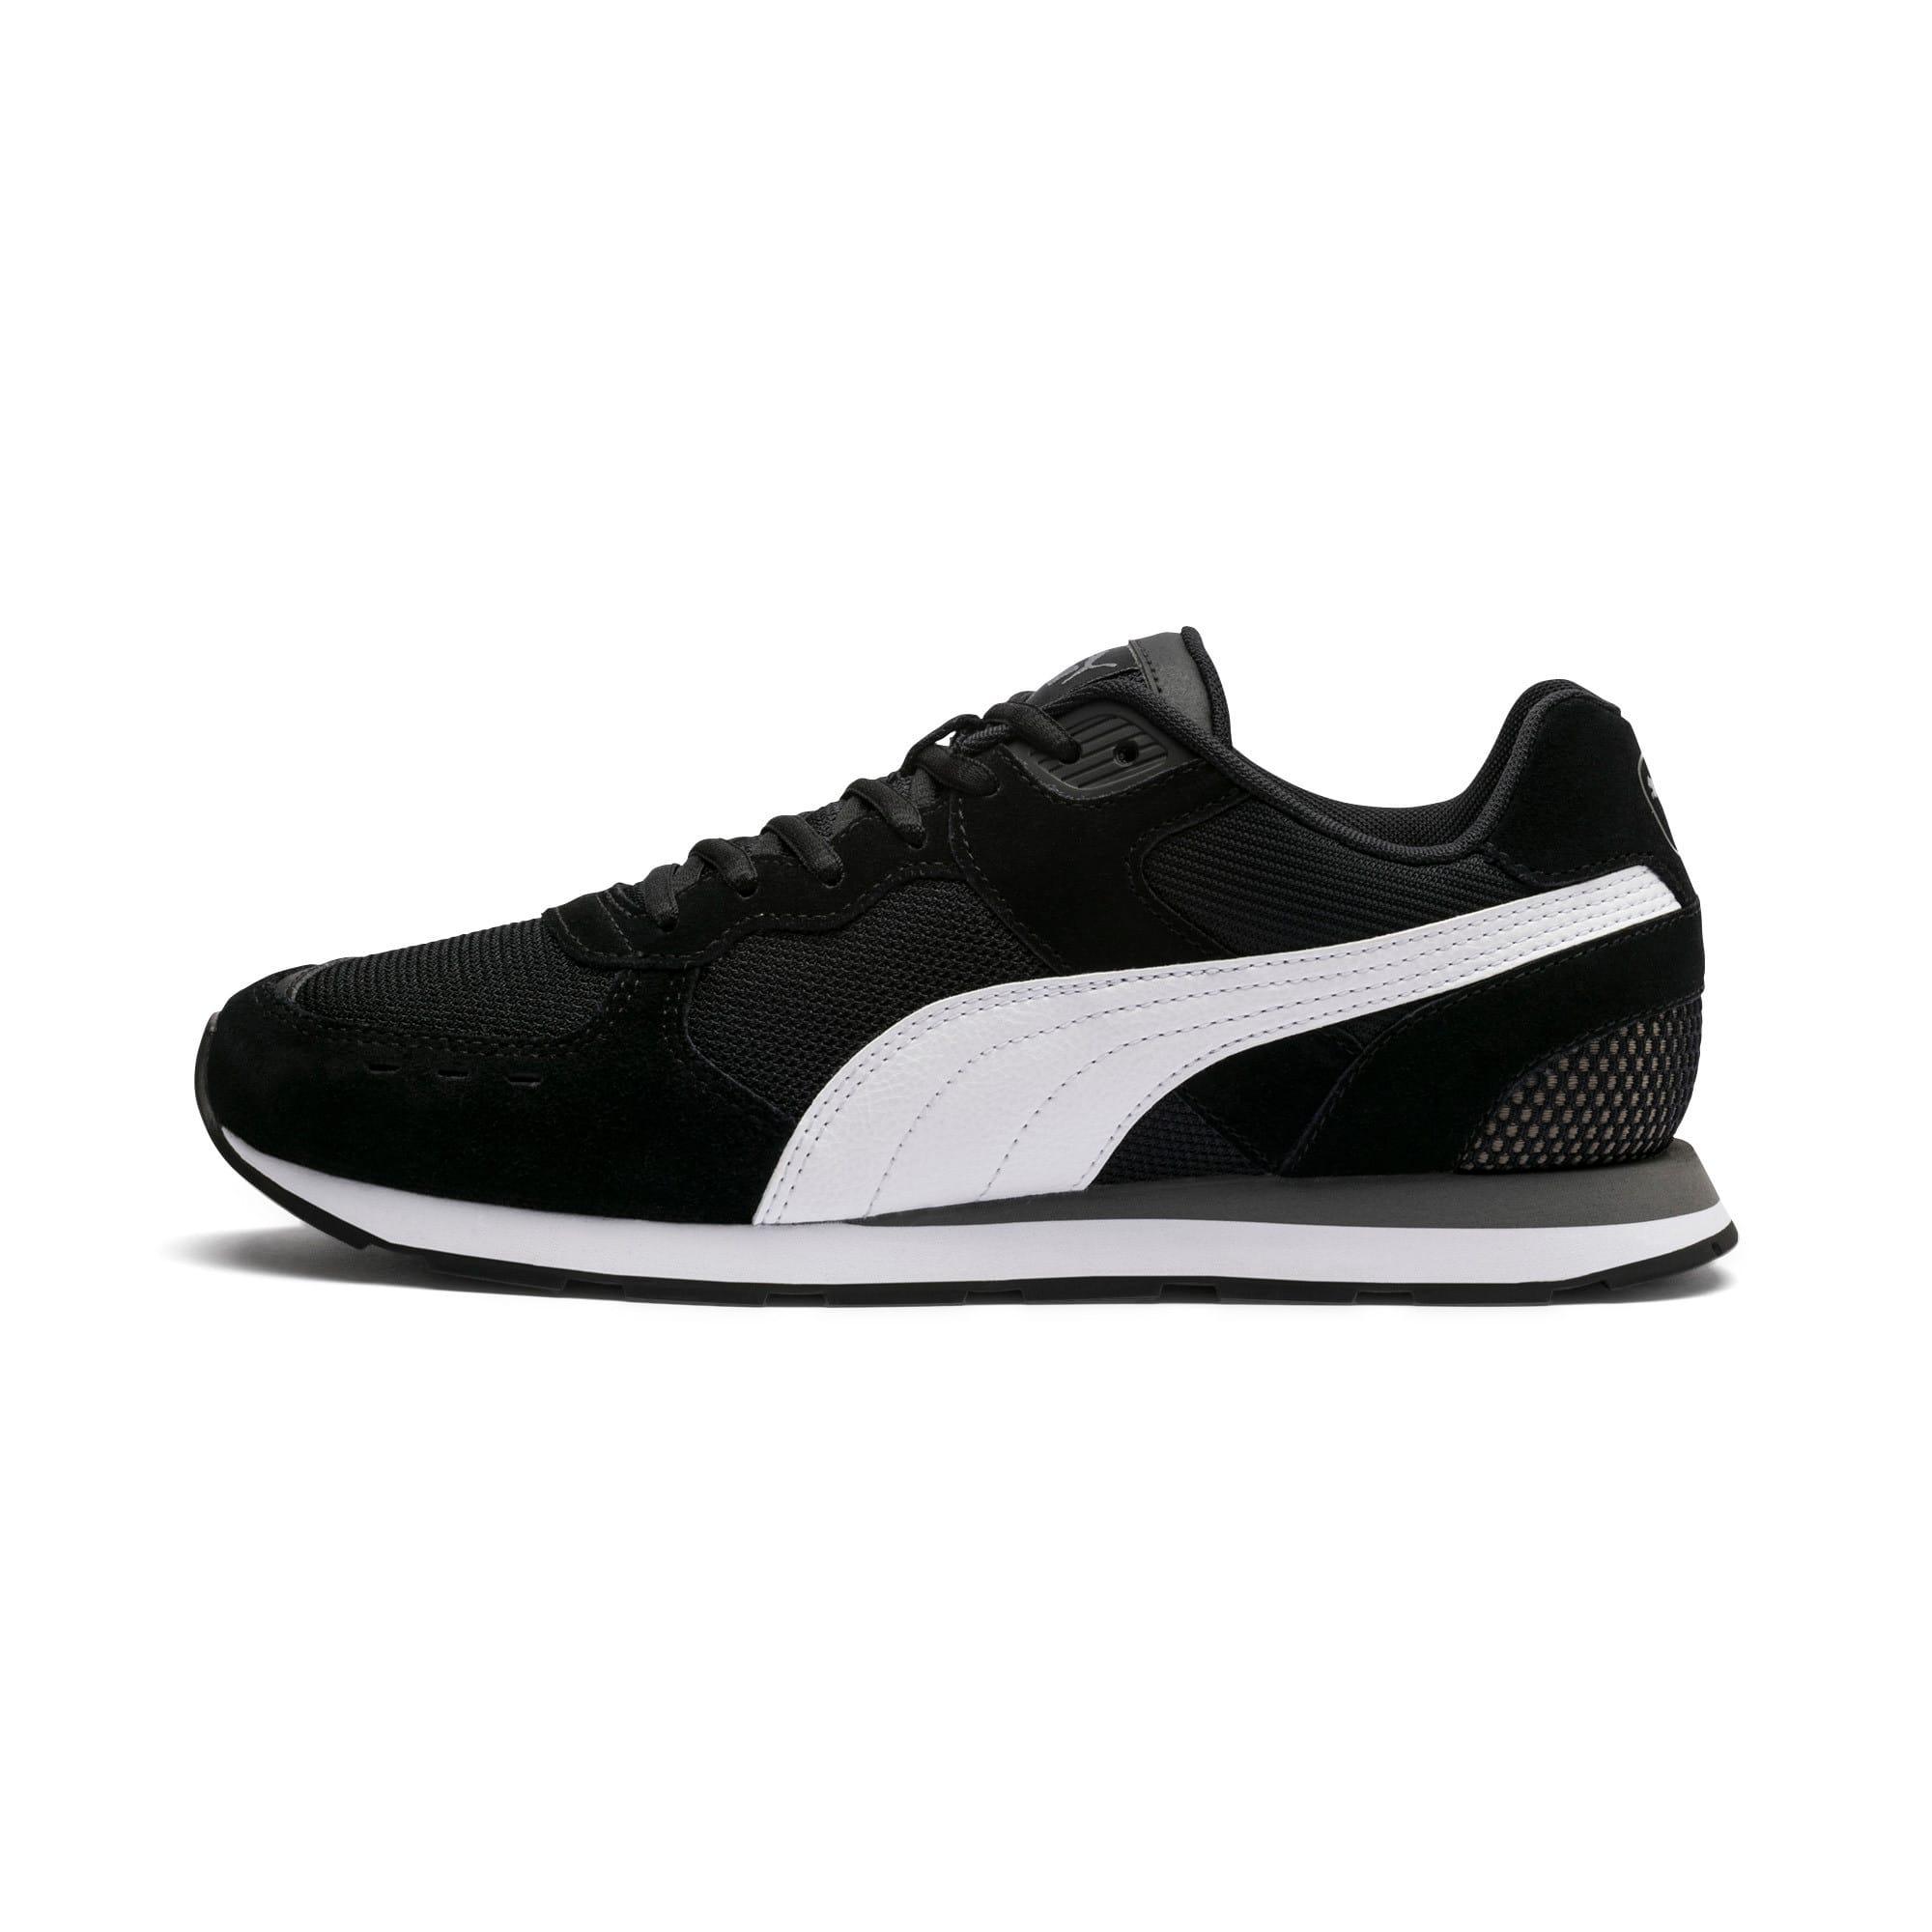 Miniatura 1 de Zapatos deportivos Vista, Black-White-Charcoal Gray, mediano